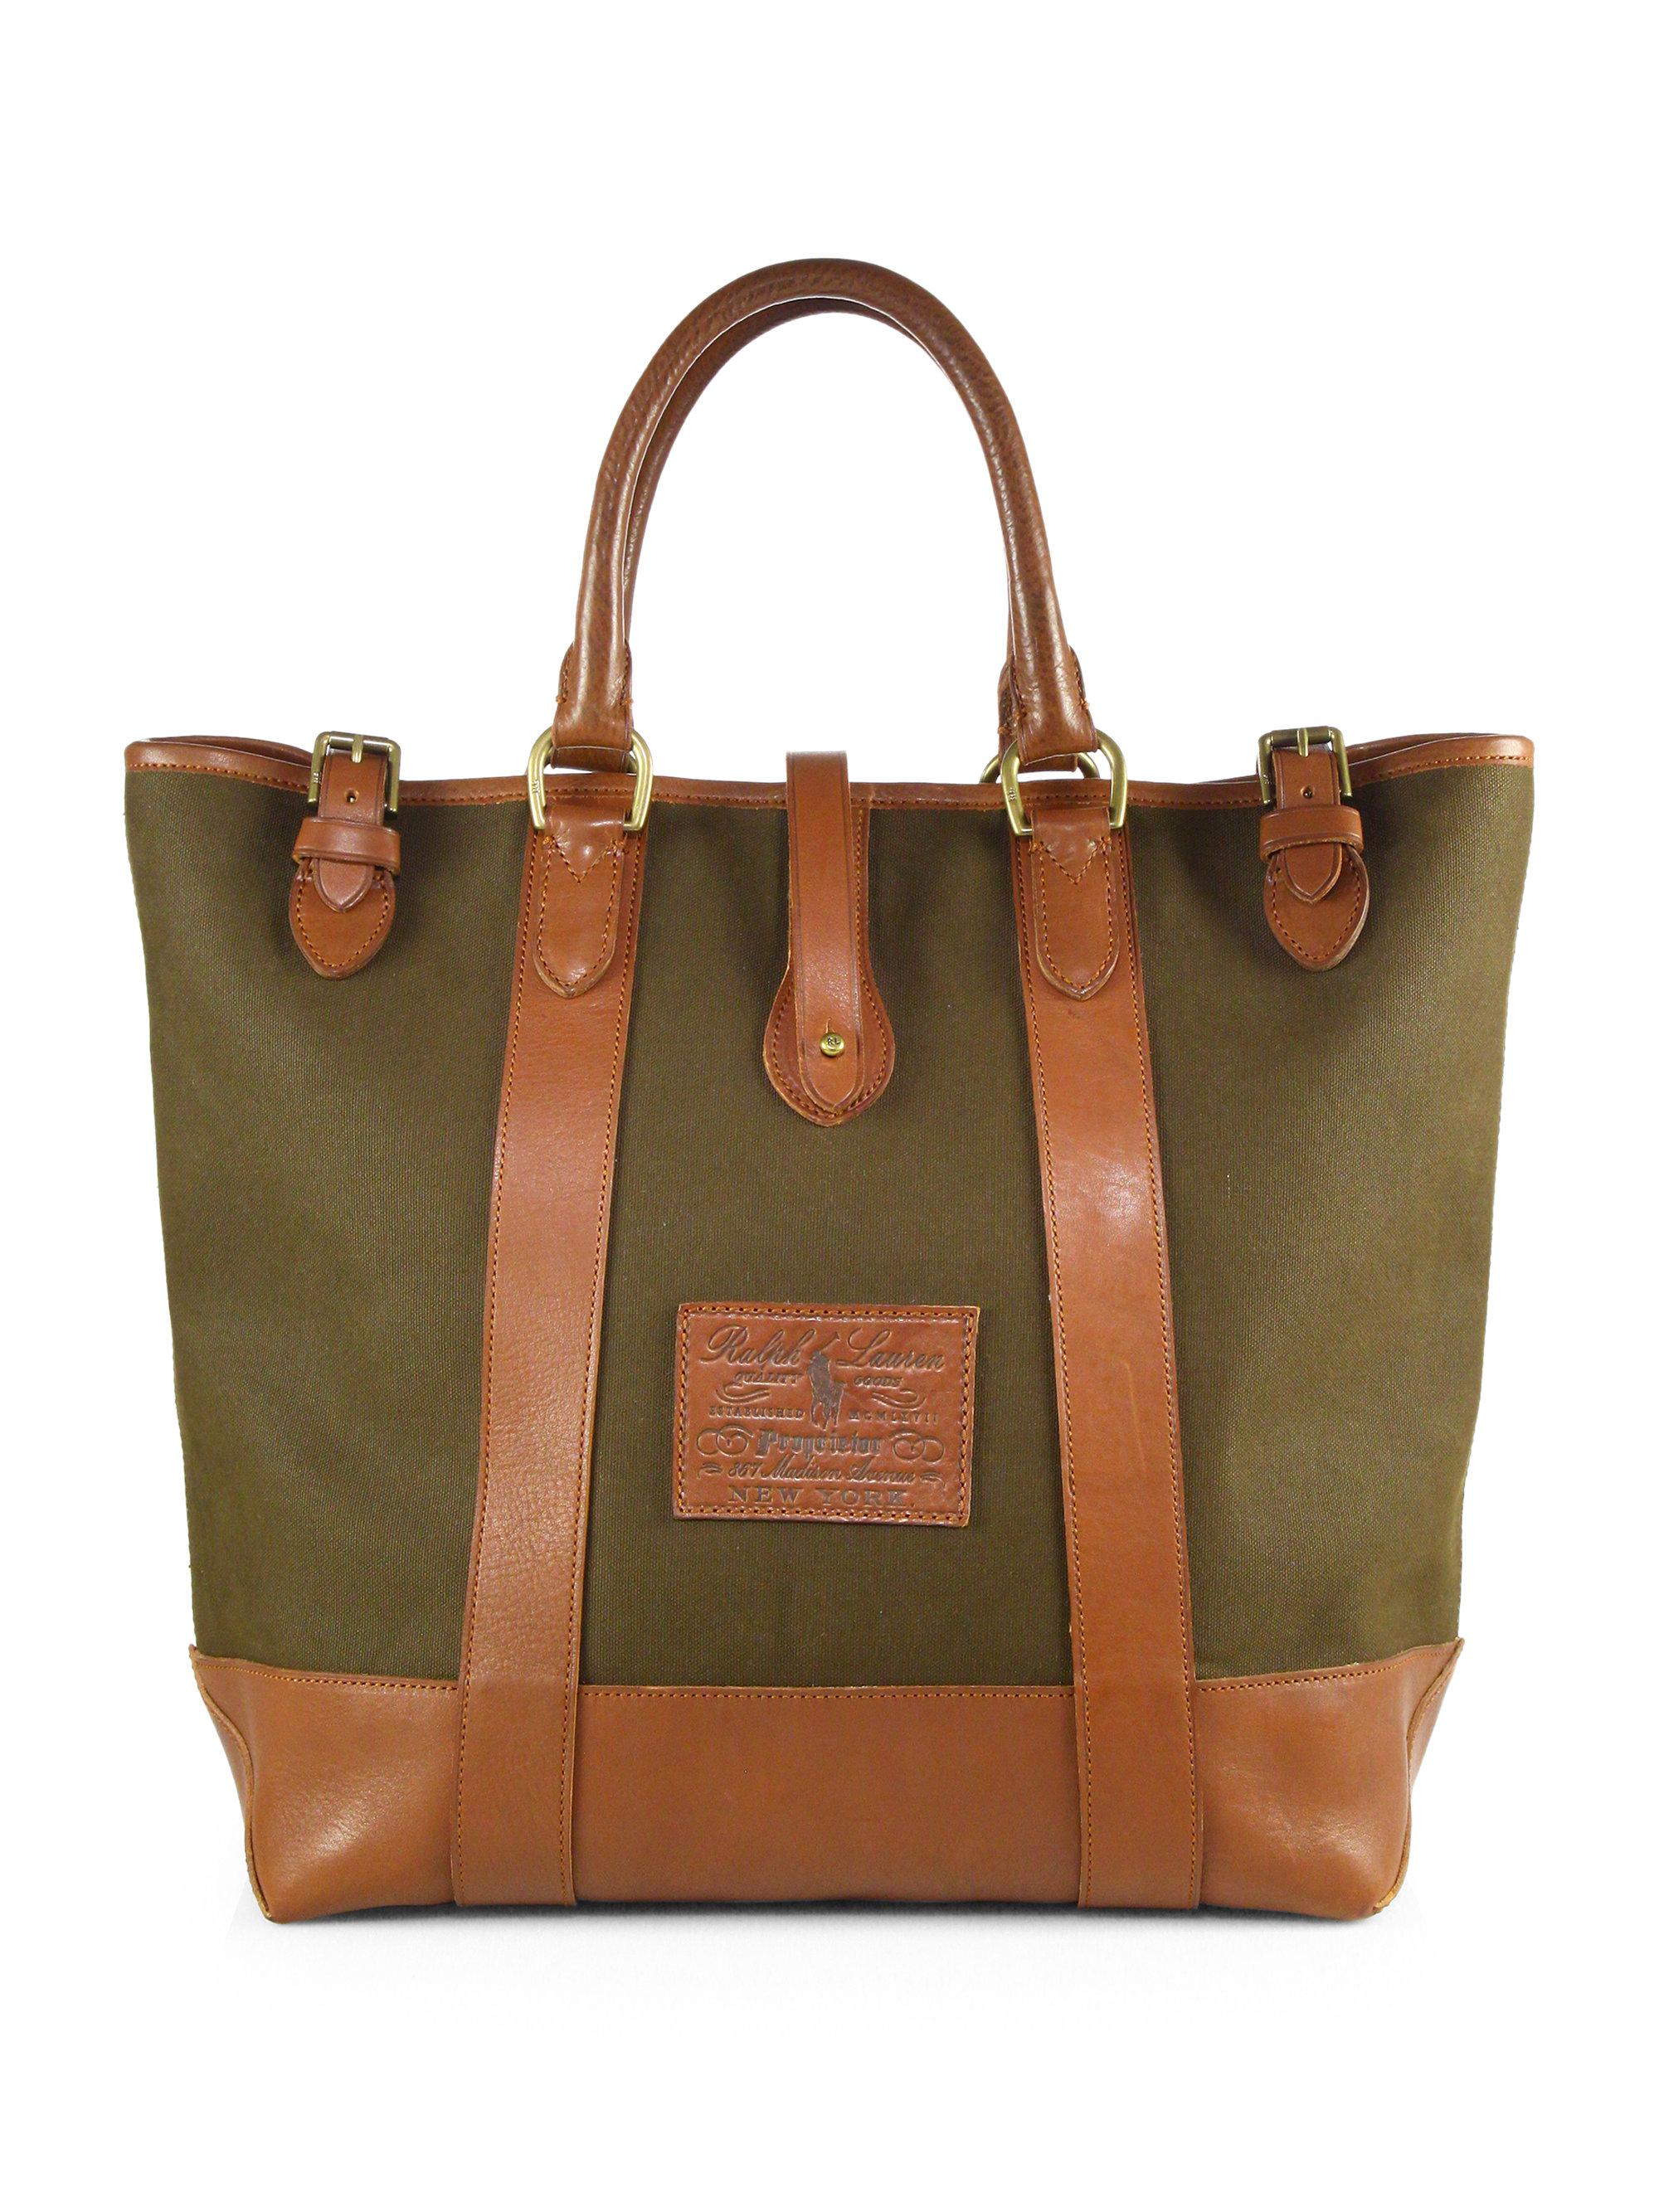 628d30a5f3 Ralph Lauren Polo White Canvas Big Pony Handbags - Jaimonvoyage.com